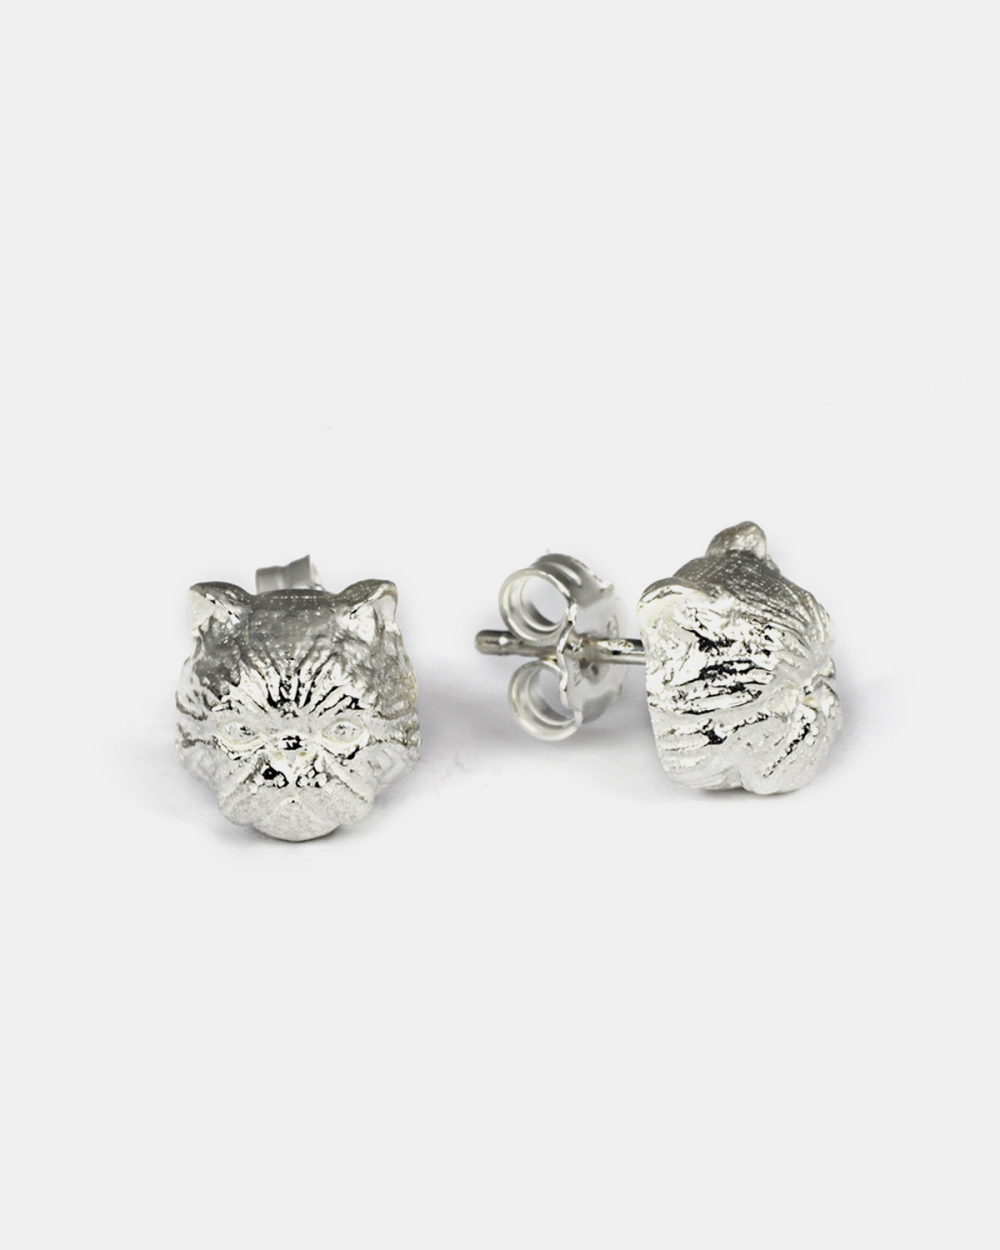 Earrings PERSIAN COUPLE EARRINGS / POLISHED BURNISHED FINISH NOVE25